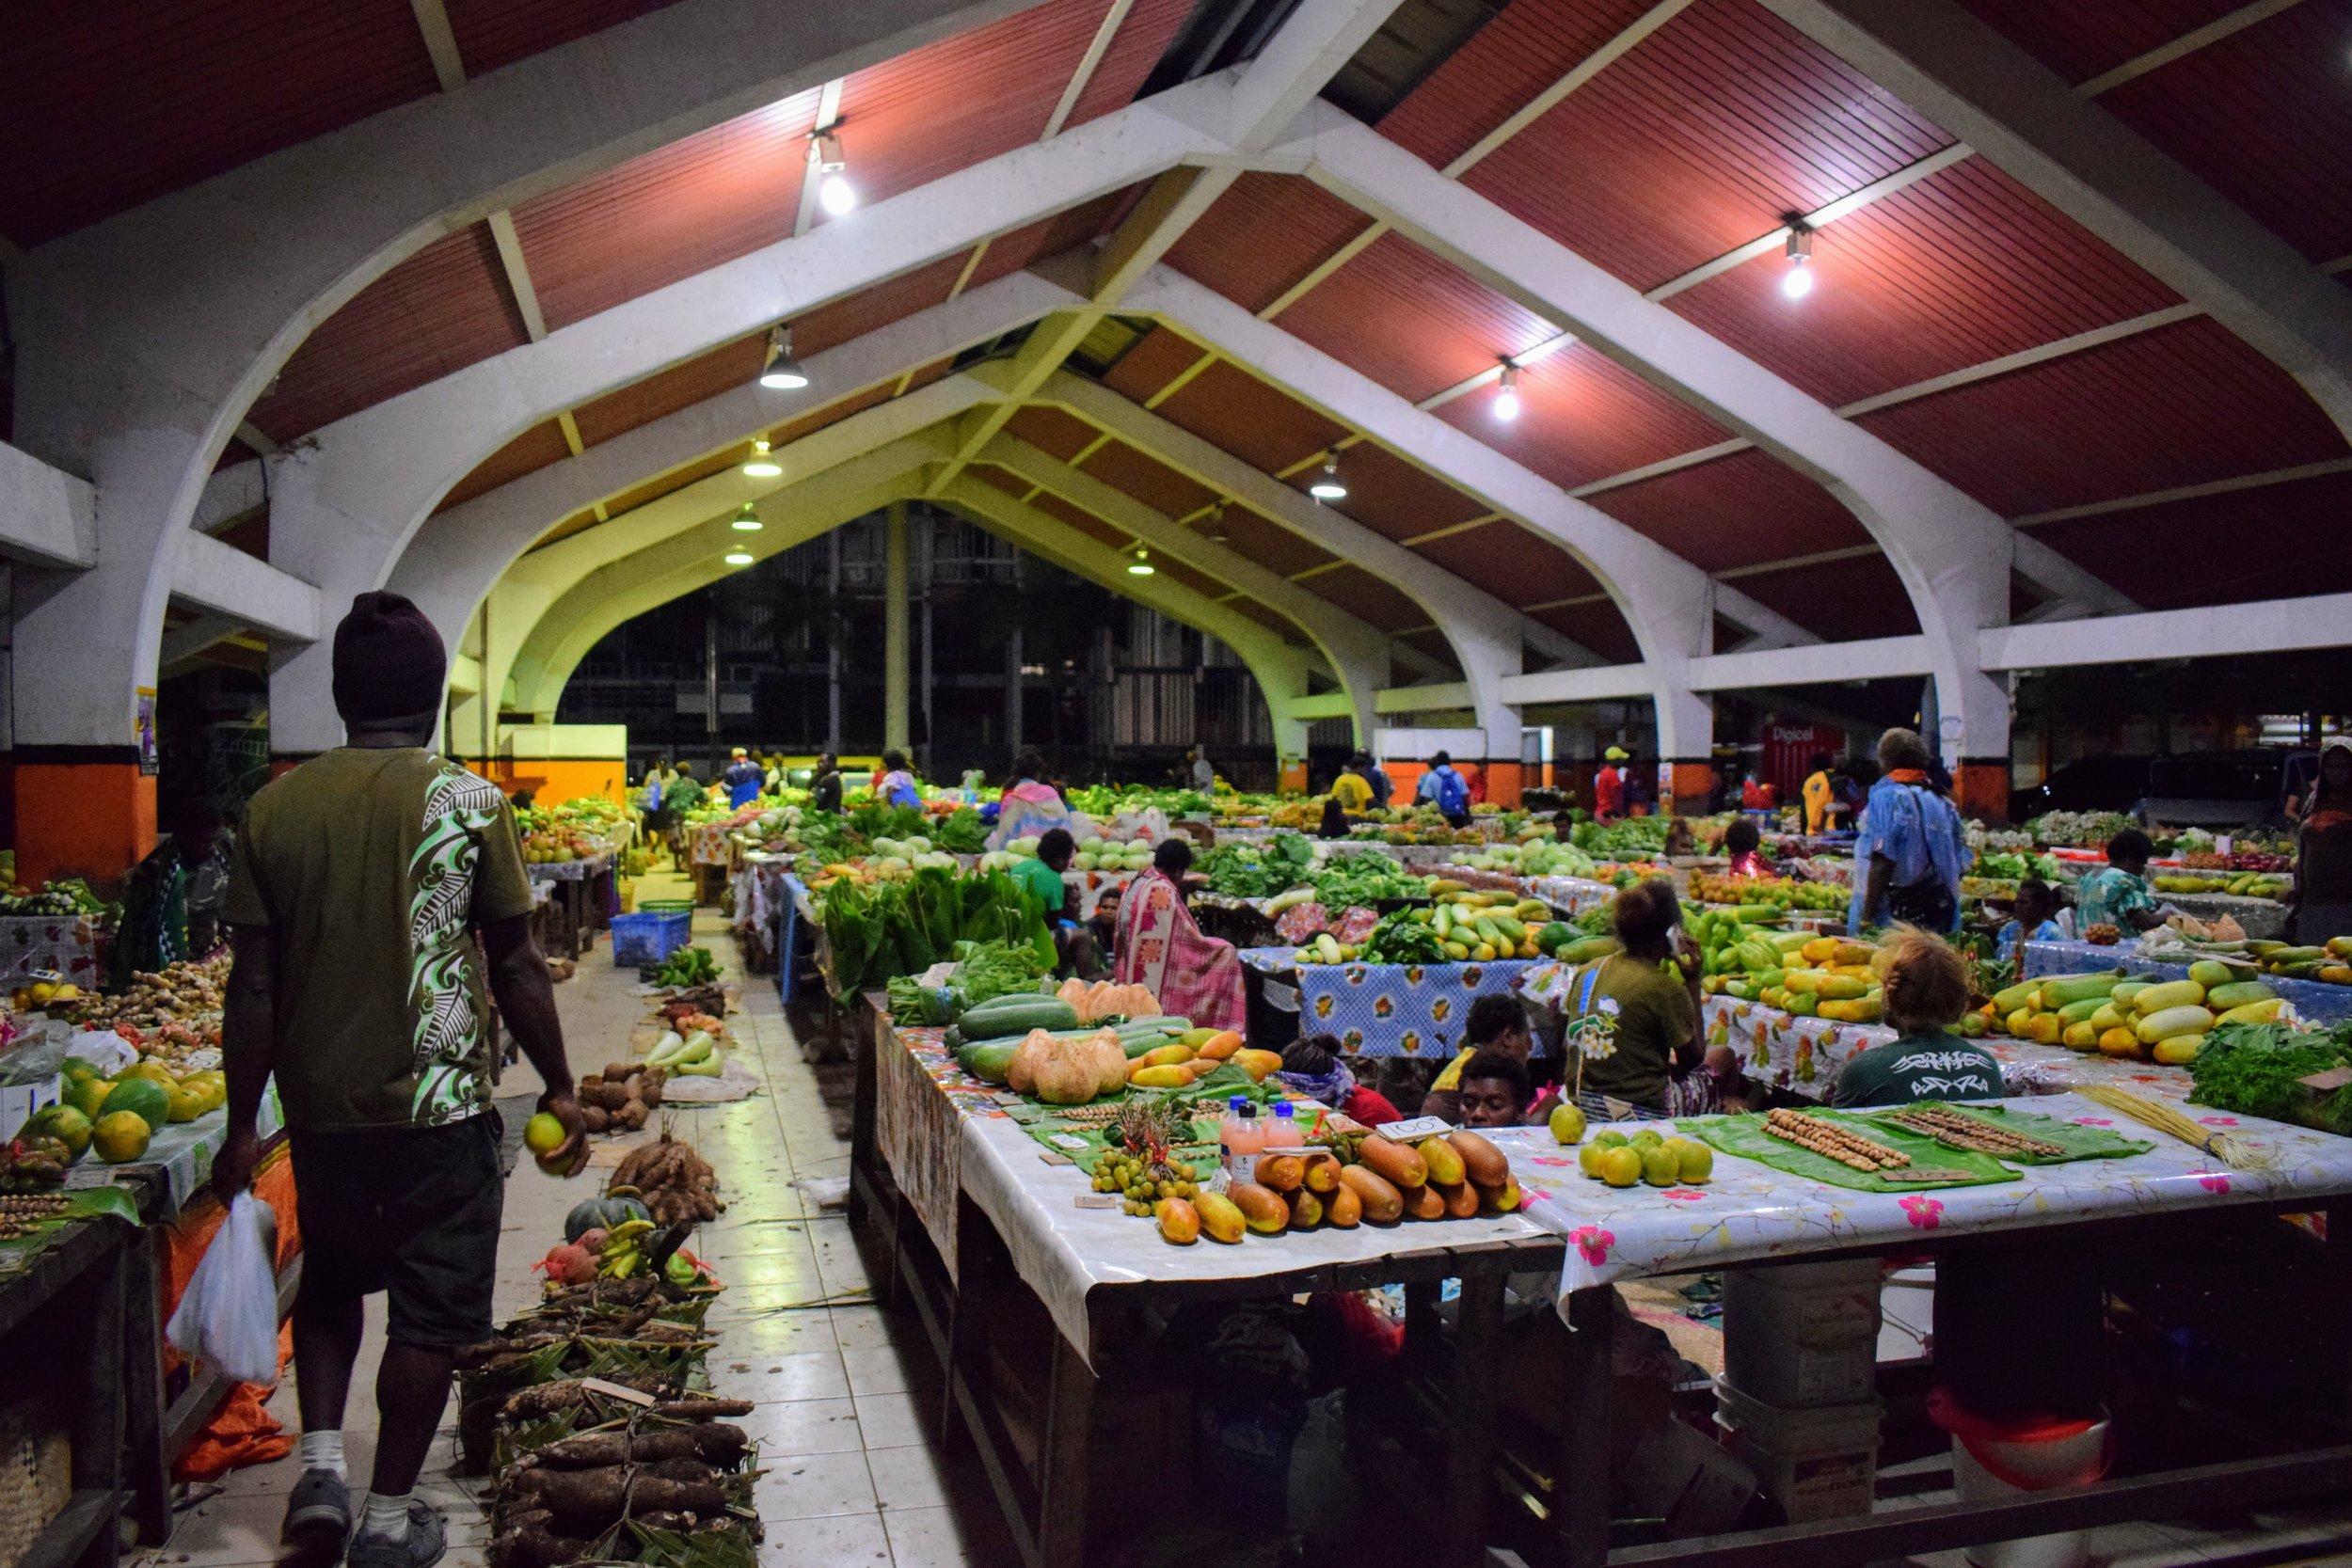 The market at around 7 PM.